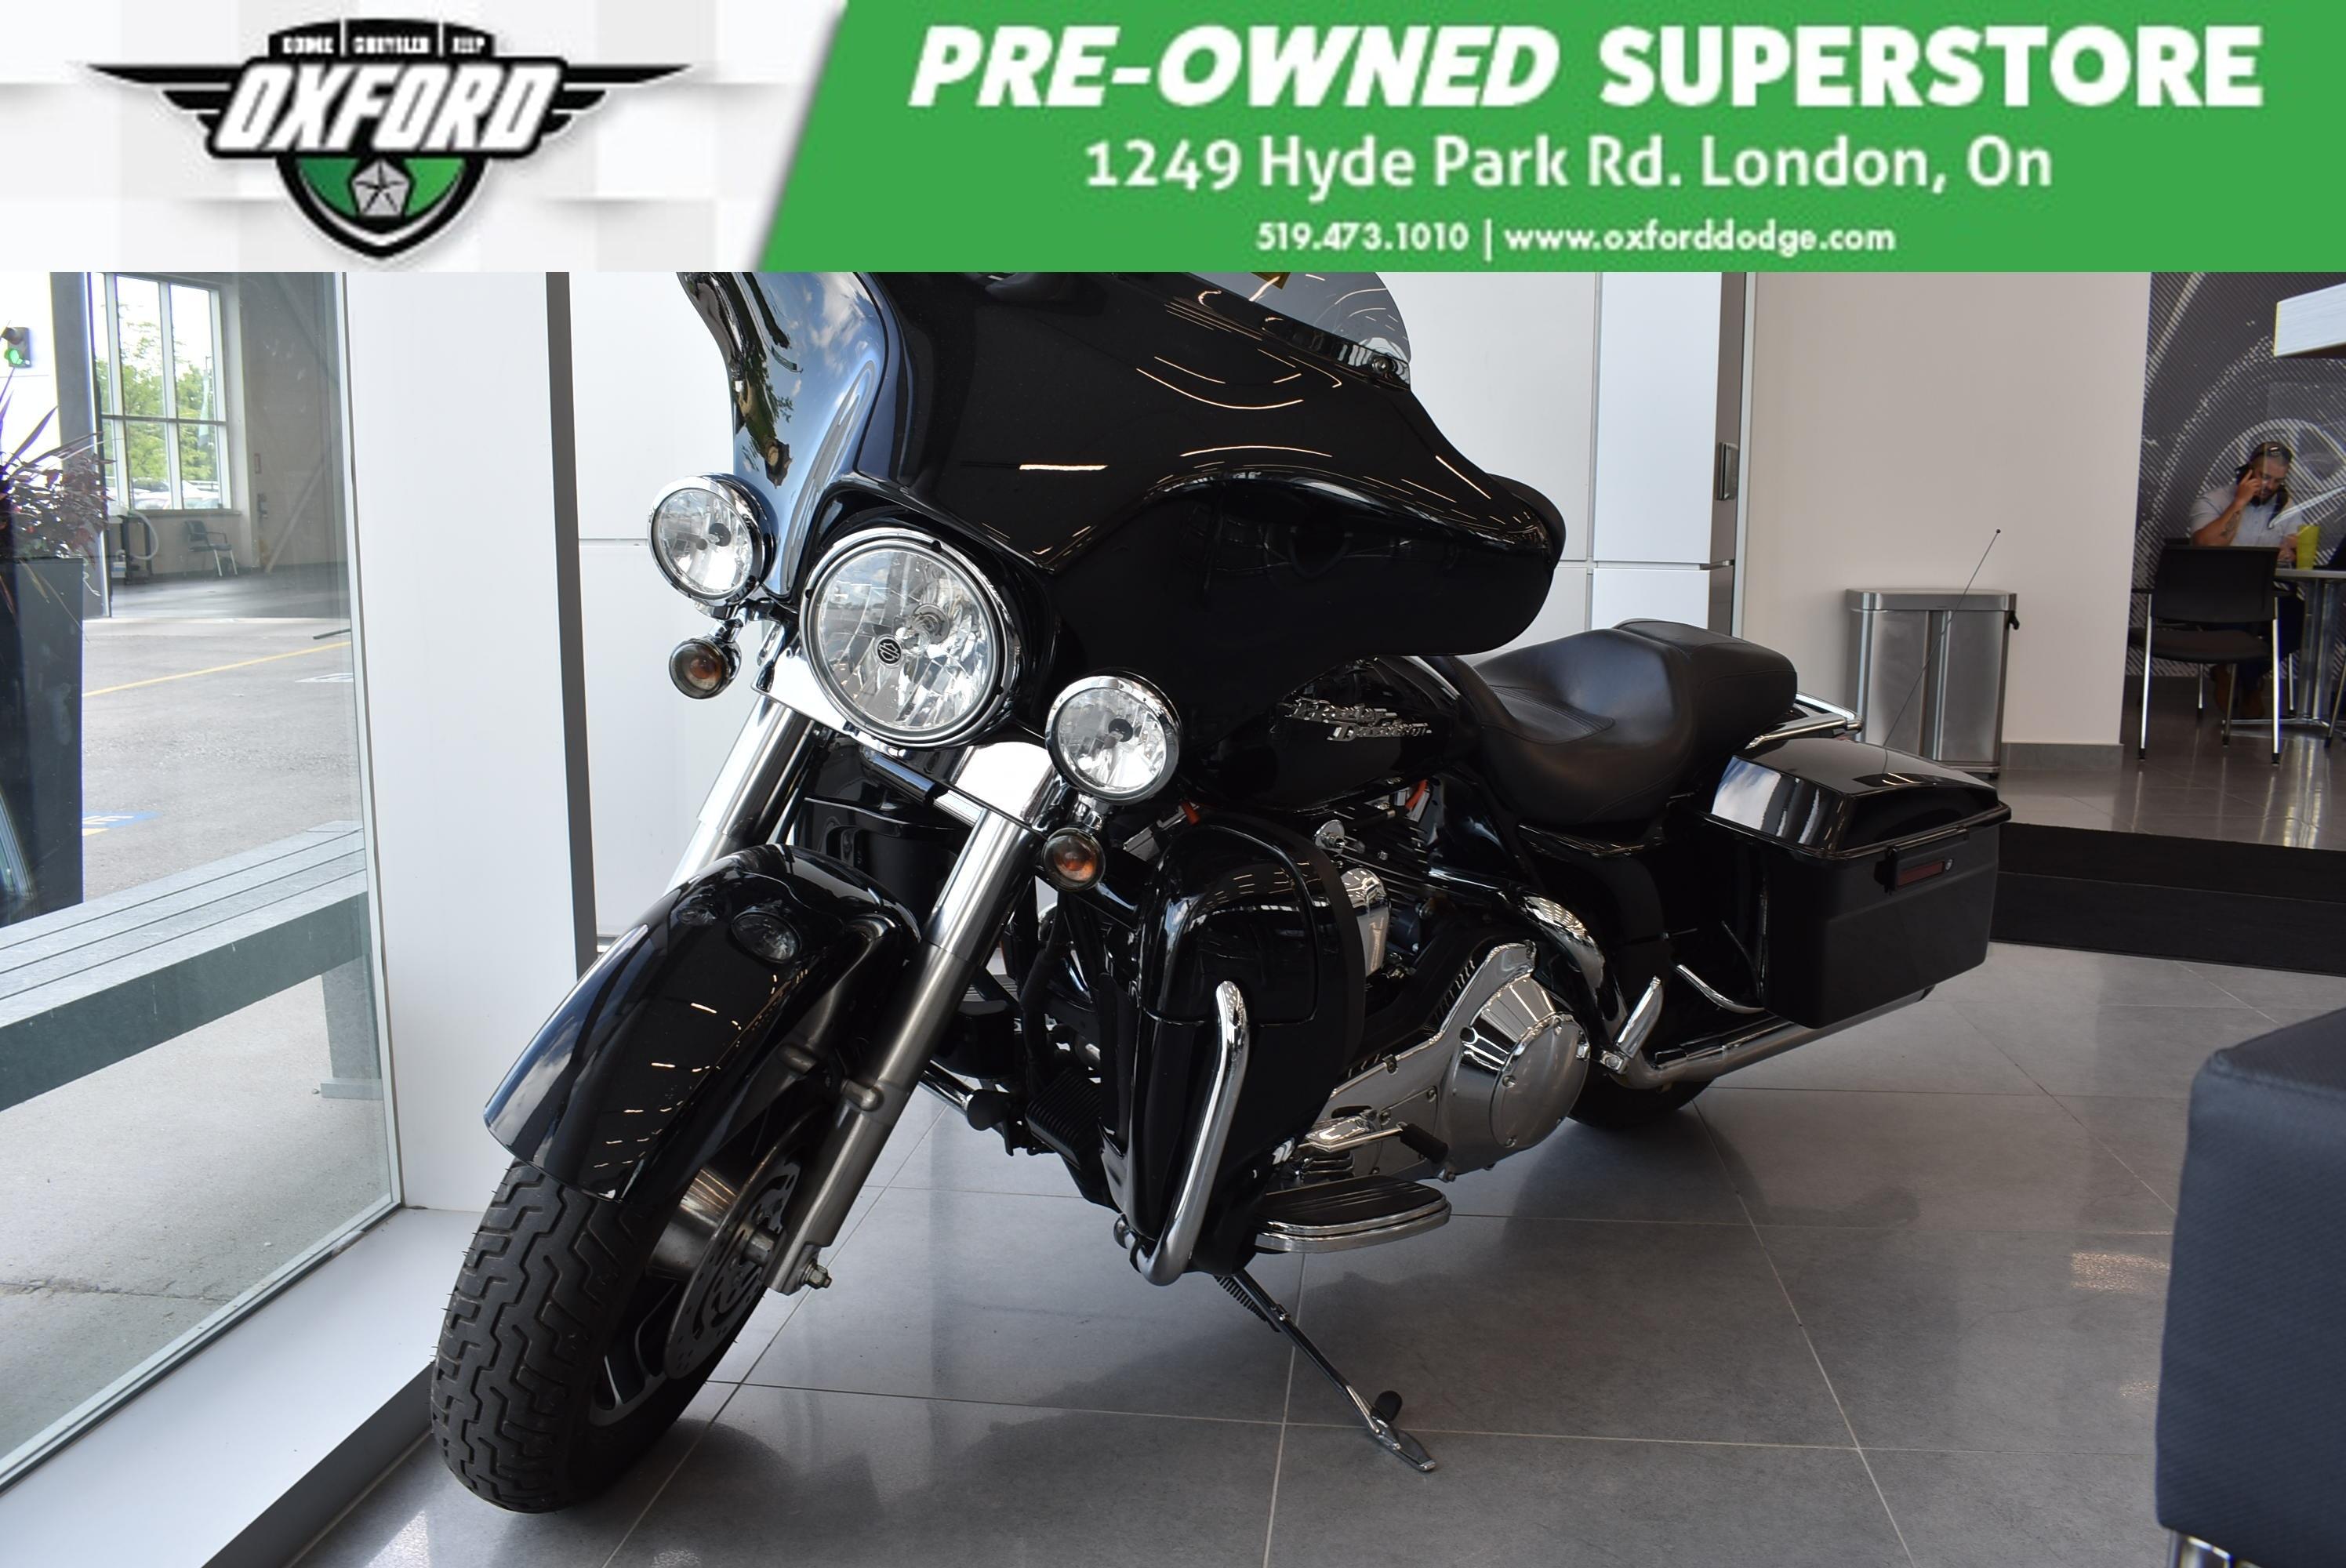 used 2006 Harley-Davidson FLHX1 car, priced at $14,988